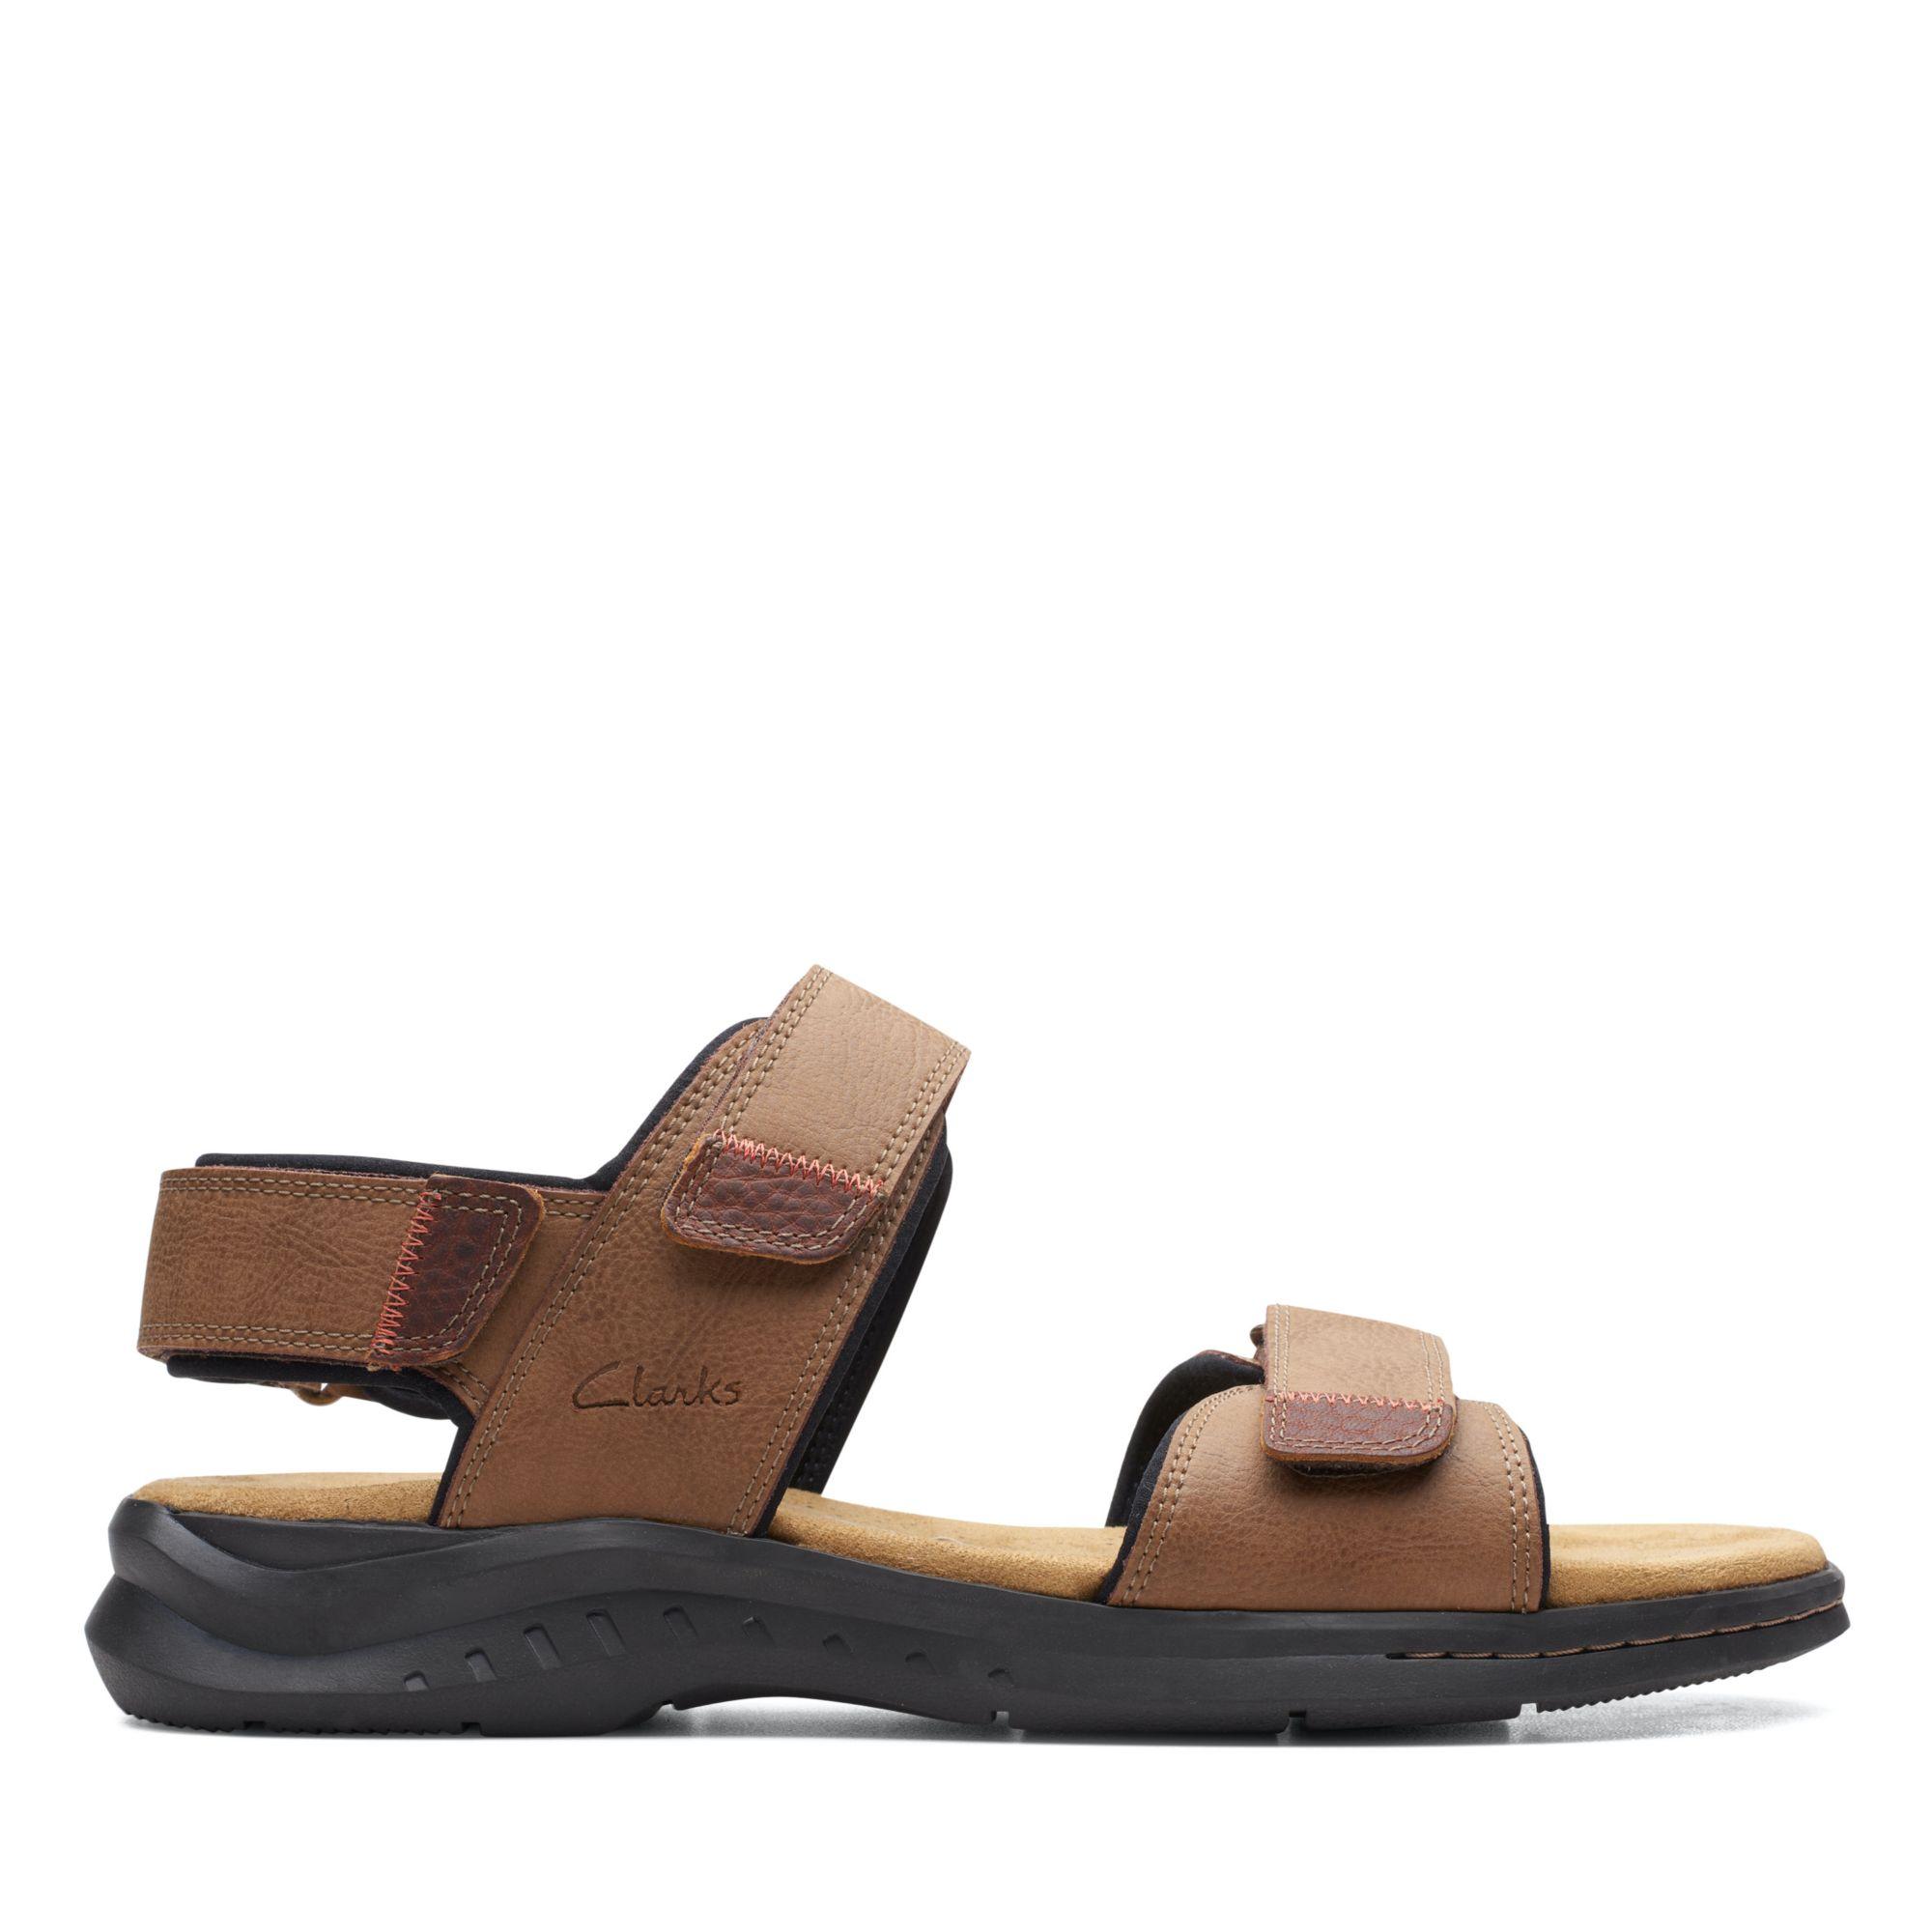 Clarks 夏日街頭-Hapsford Creek 摩鬼氈涼鞋(棕褐色)